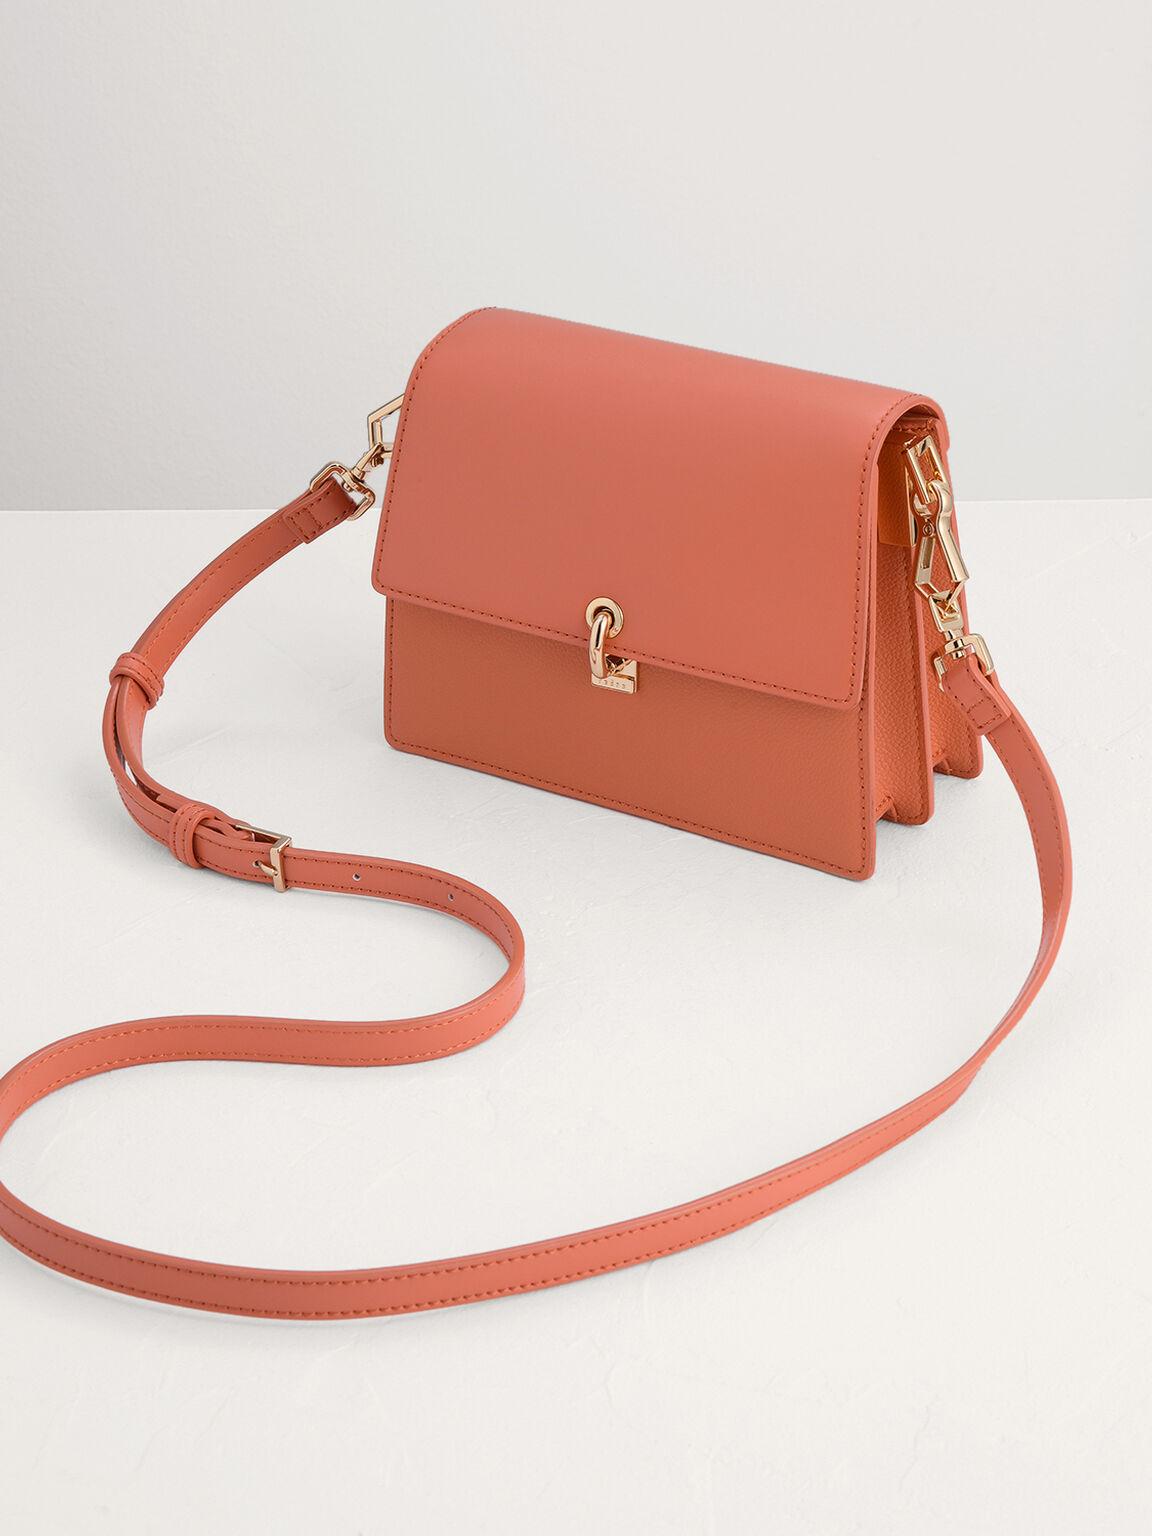 Mini Bag with Twill Details, Peach, hi-res